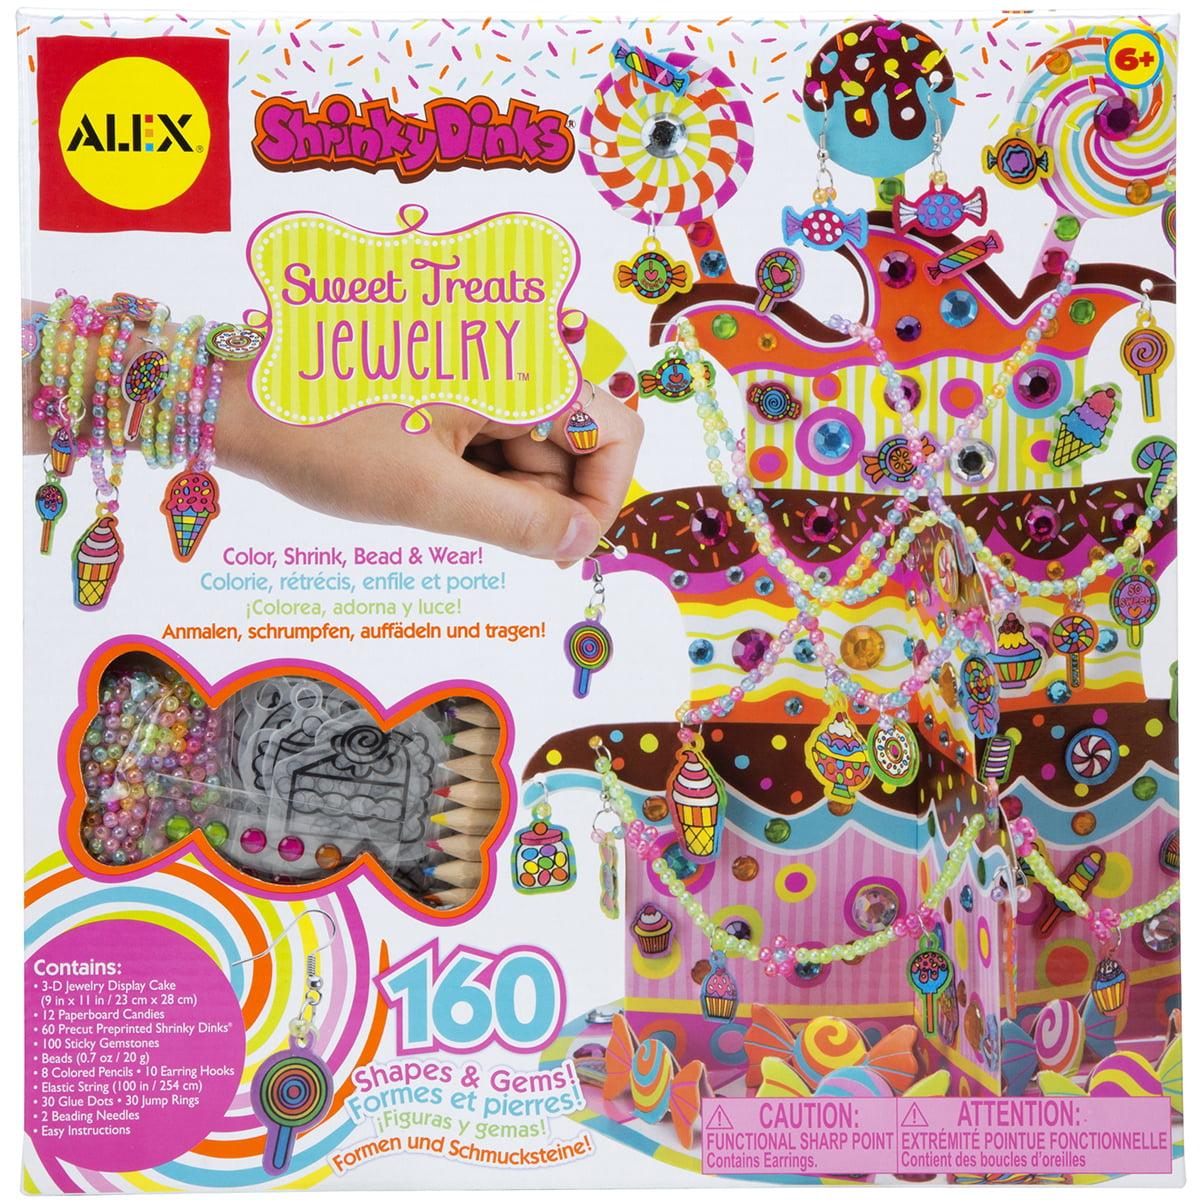 Sweet Treats Jewelry Kit